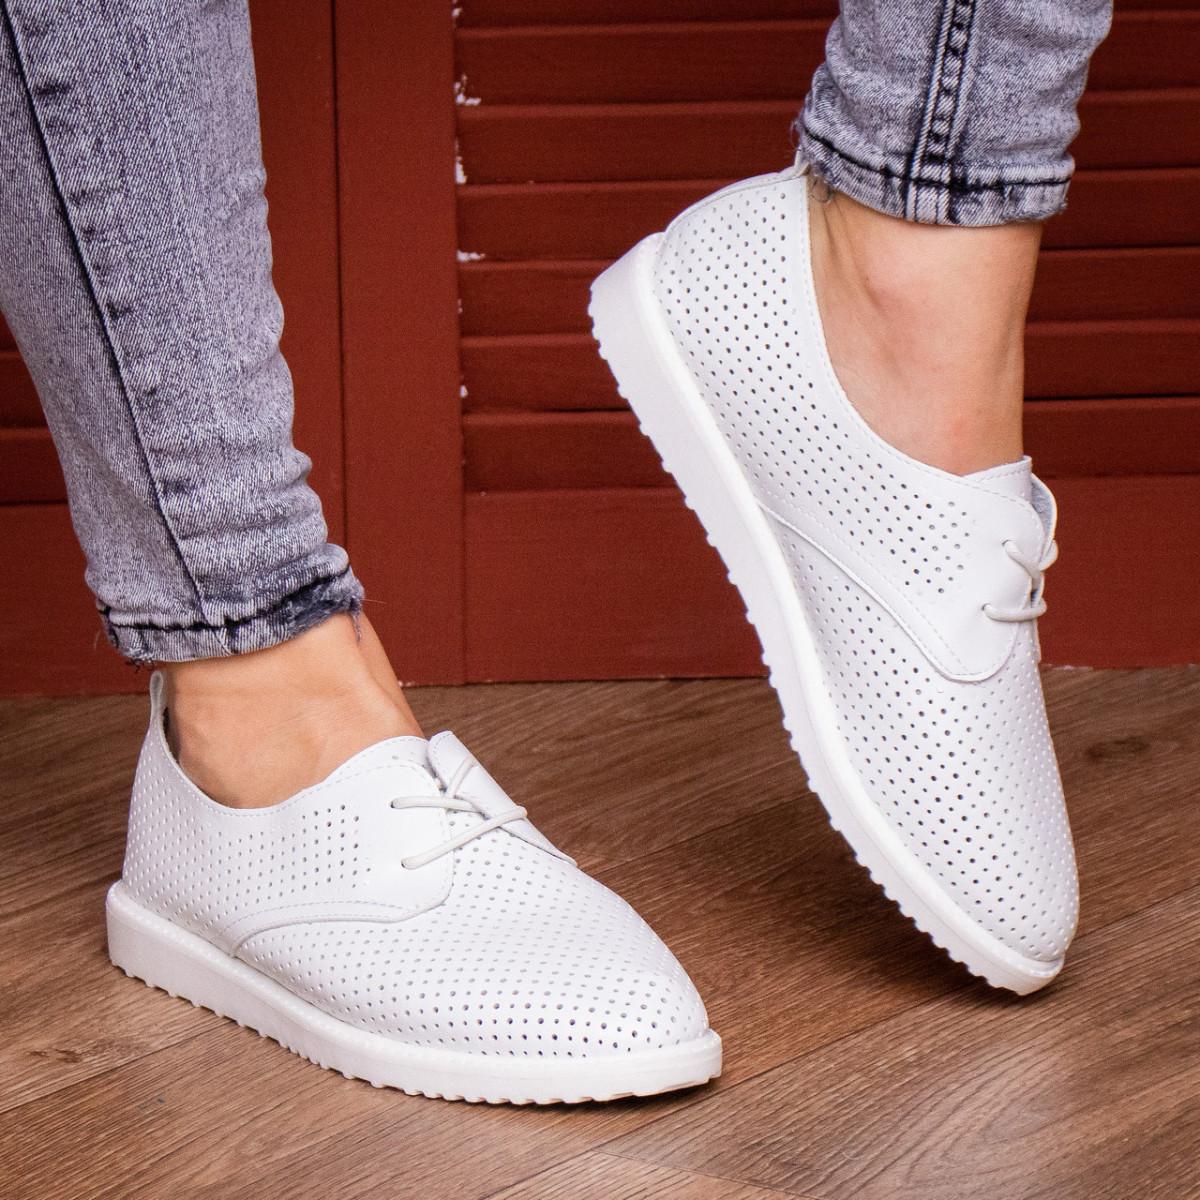 Женские туфли Fashion Twinkle 1784 36 размер 23 см Белый